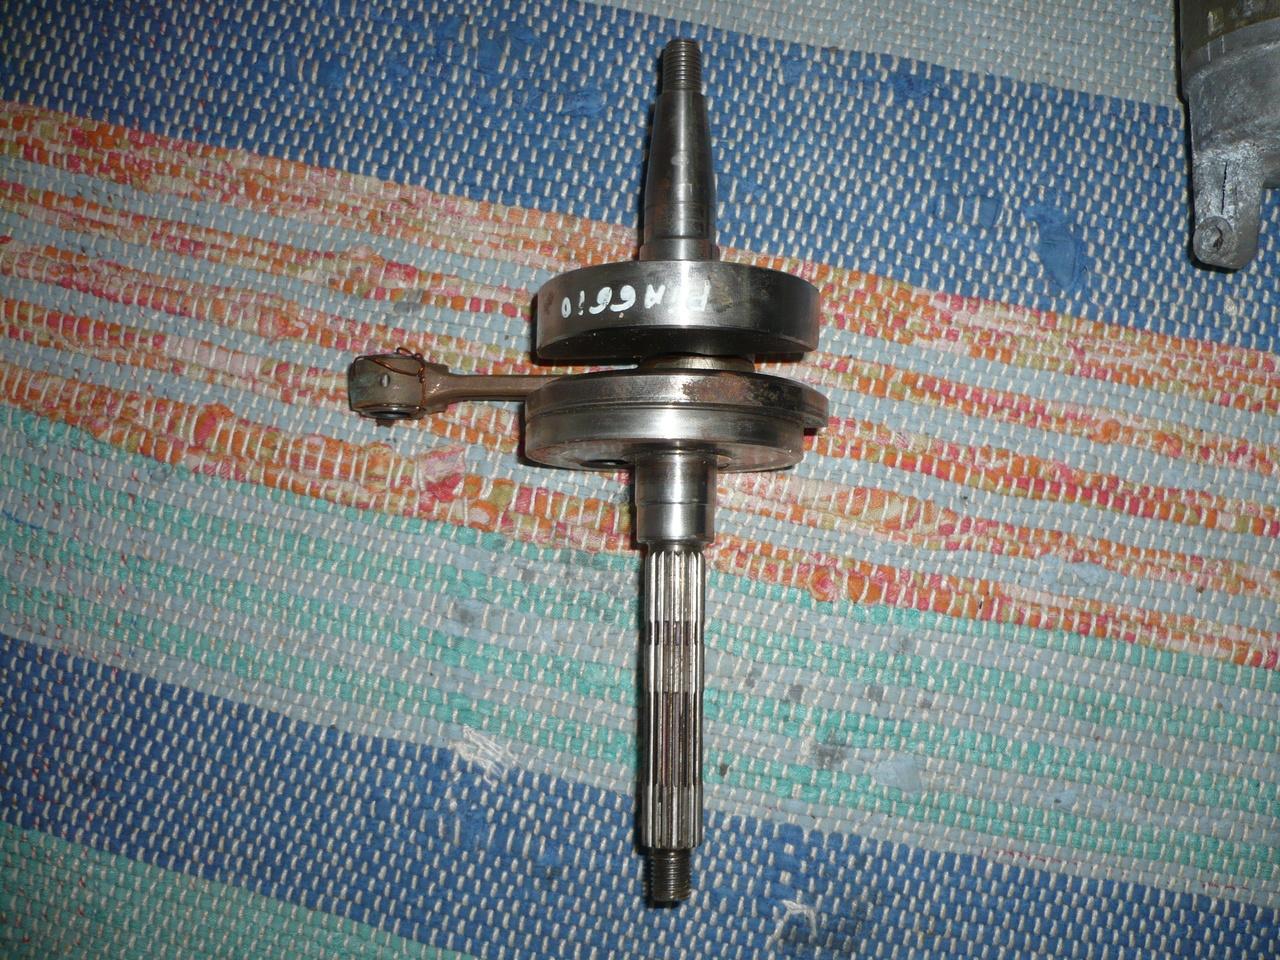 Ambielaj Aprilia SR Street - R Factory (03-08) - Gilera Runner Purejet (02-12) - Piaggio NRG Purejet